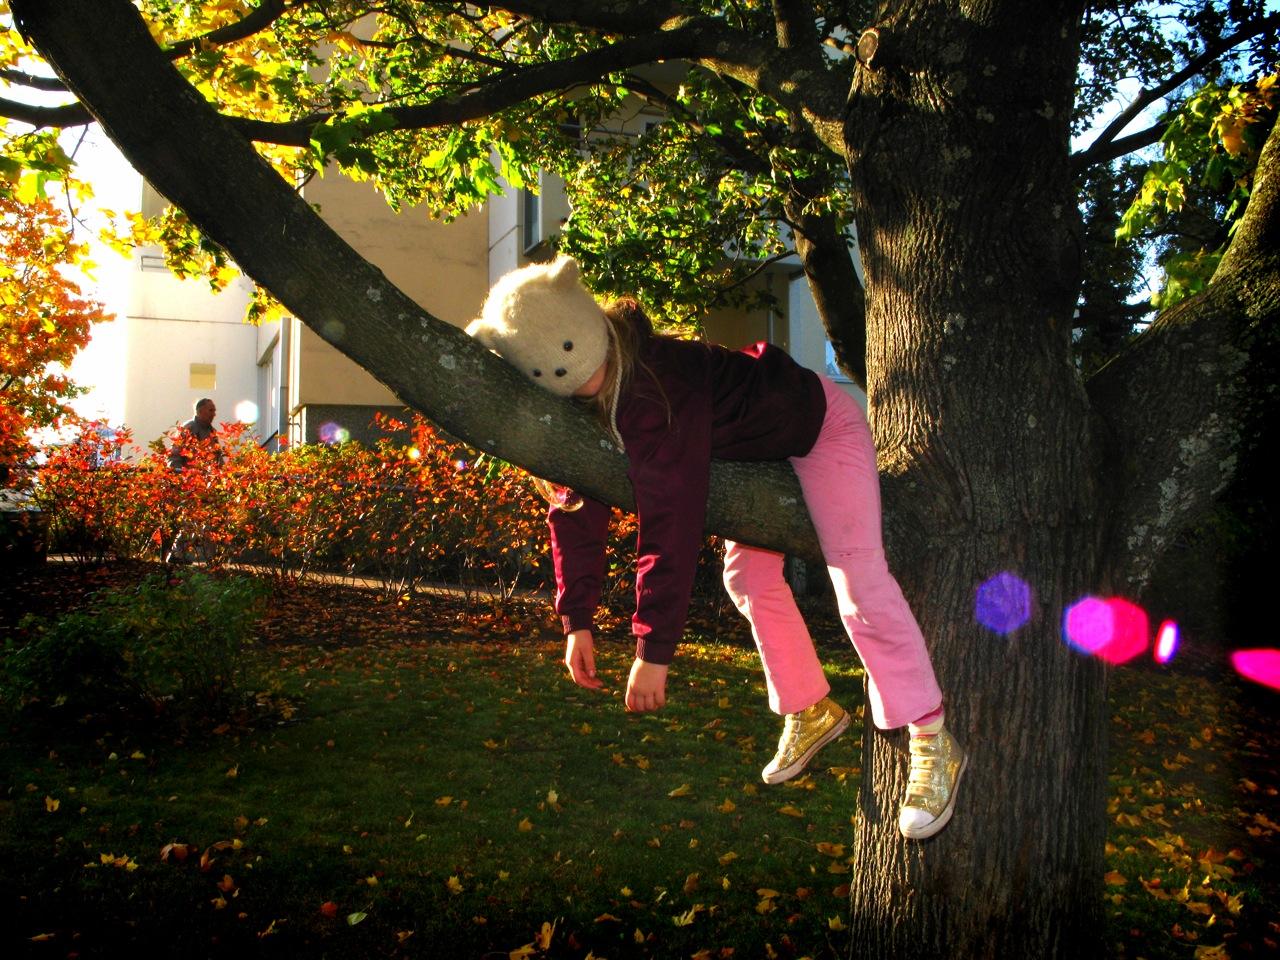 sloth-cc-Risto Kuulasmaa via flickr